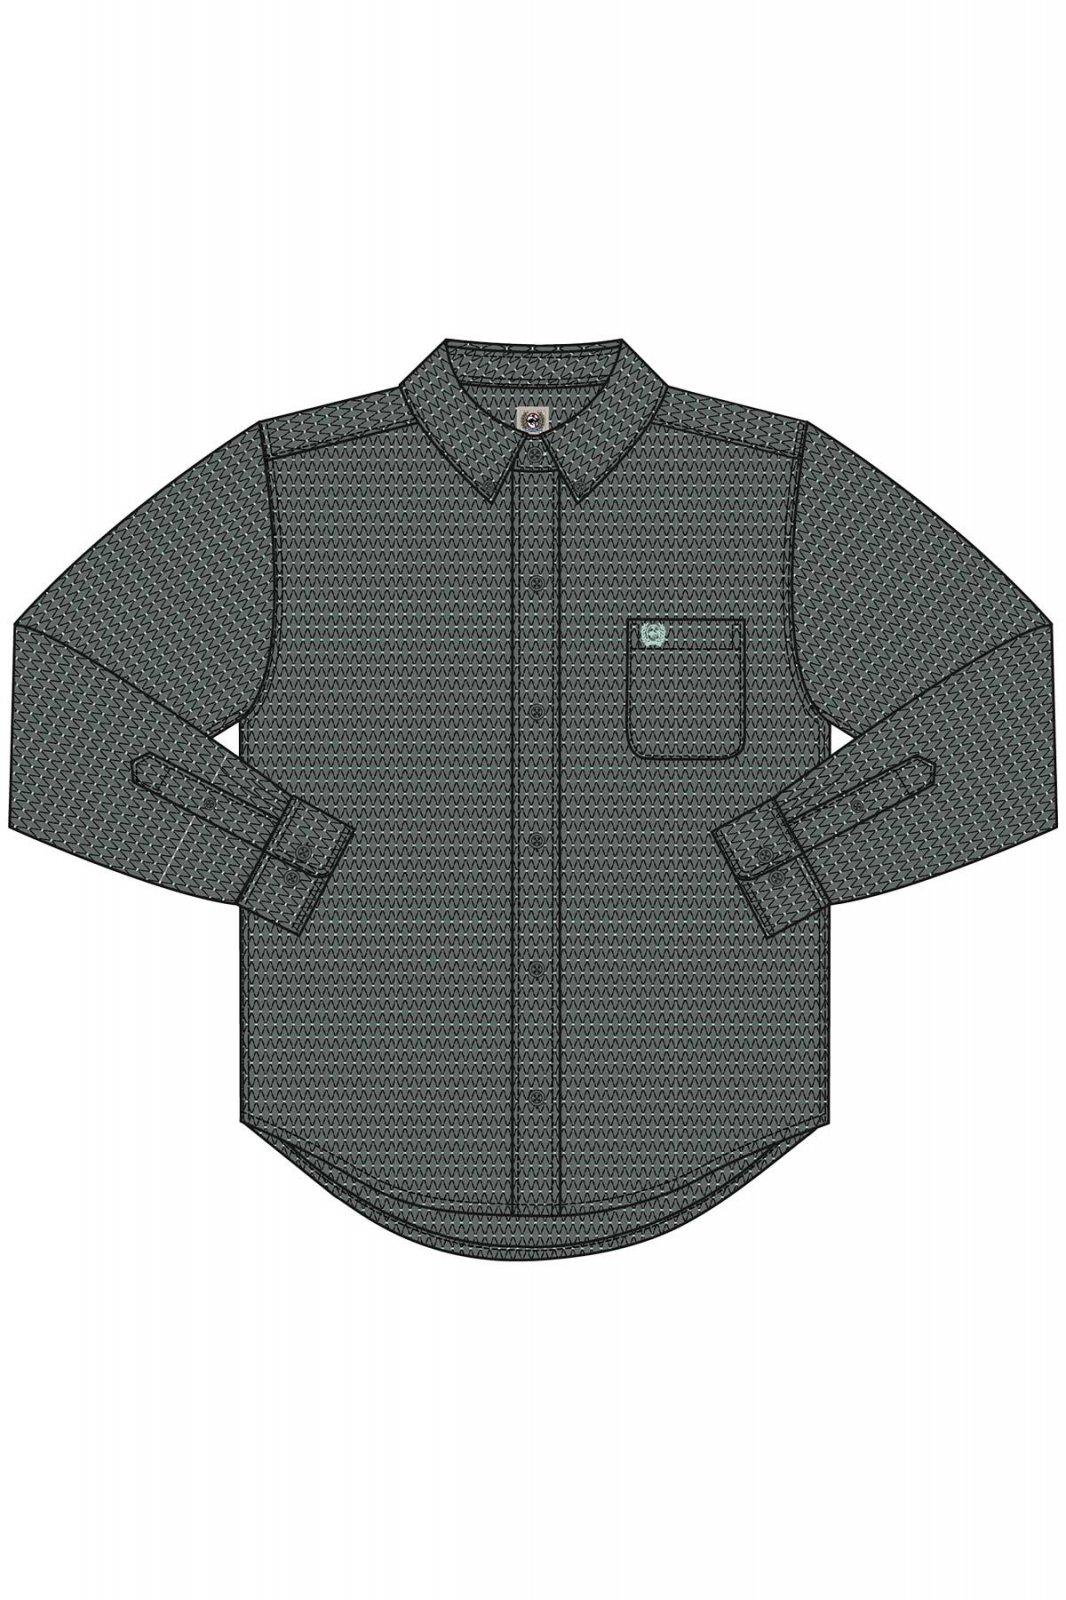 Boy's Cinch LS Cotton/Spandex Shirt Grey